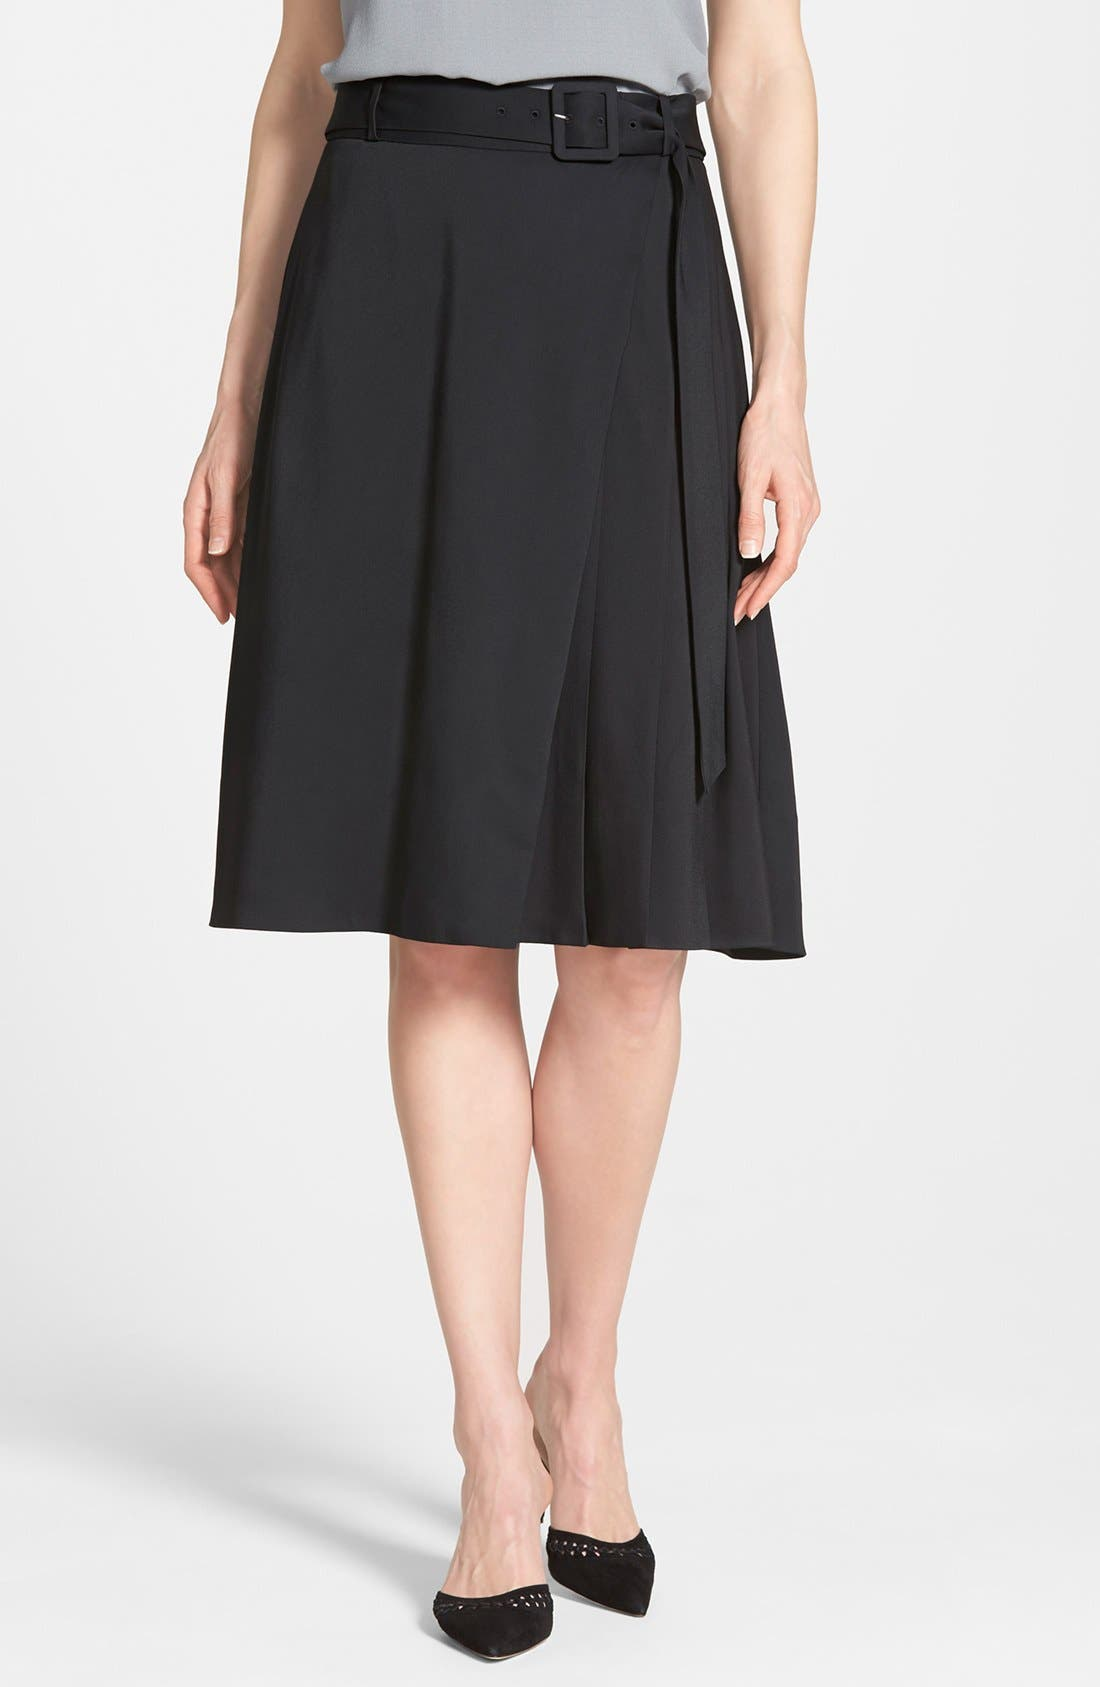 Alternate Image 1 Selected - Classiques Entier® Belted Full Skirt (Regular & Petite)